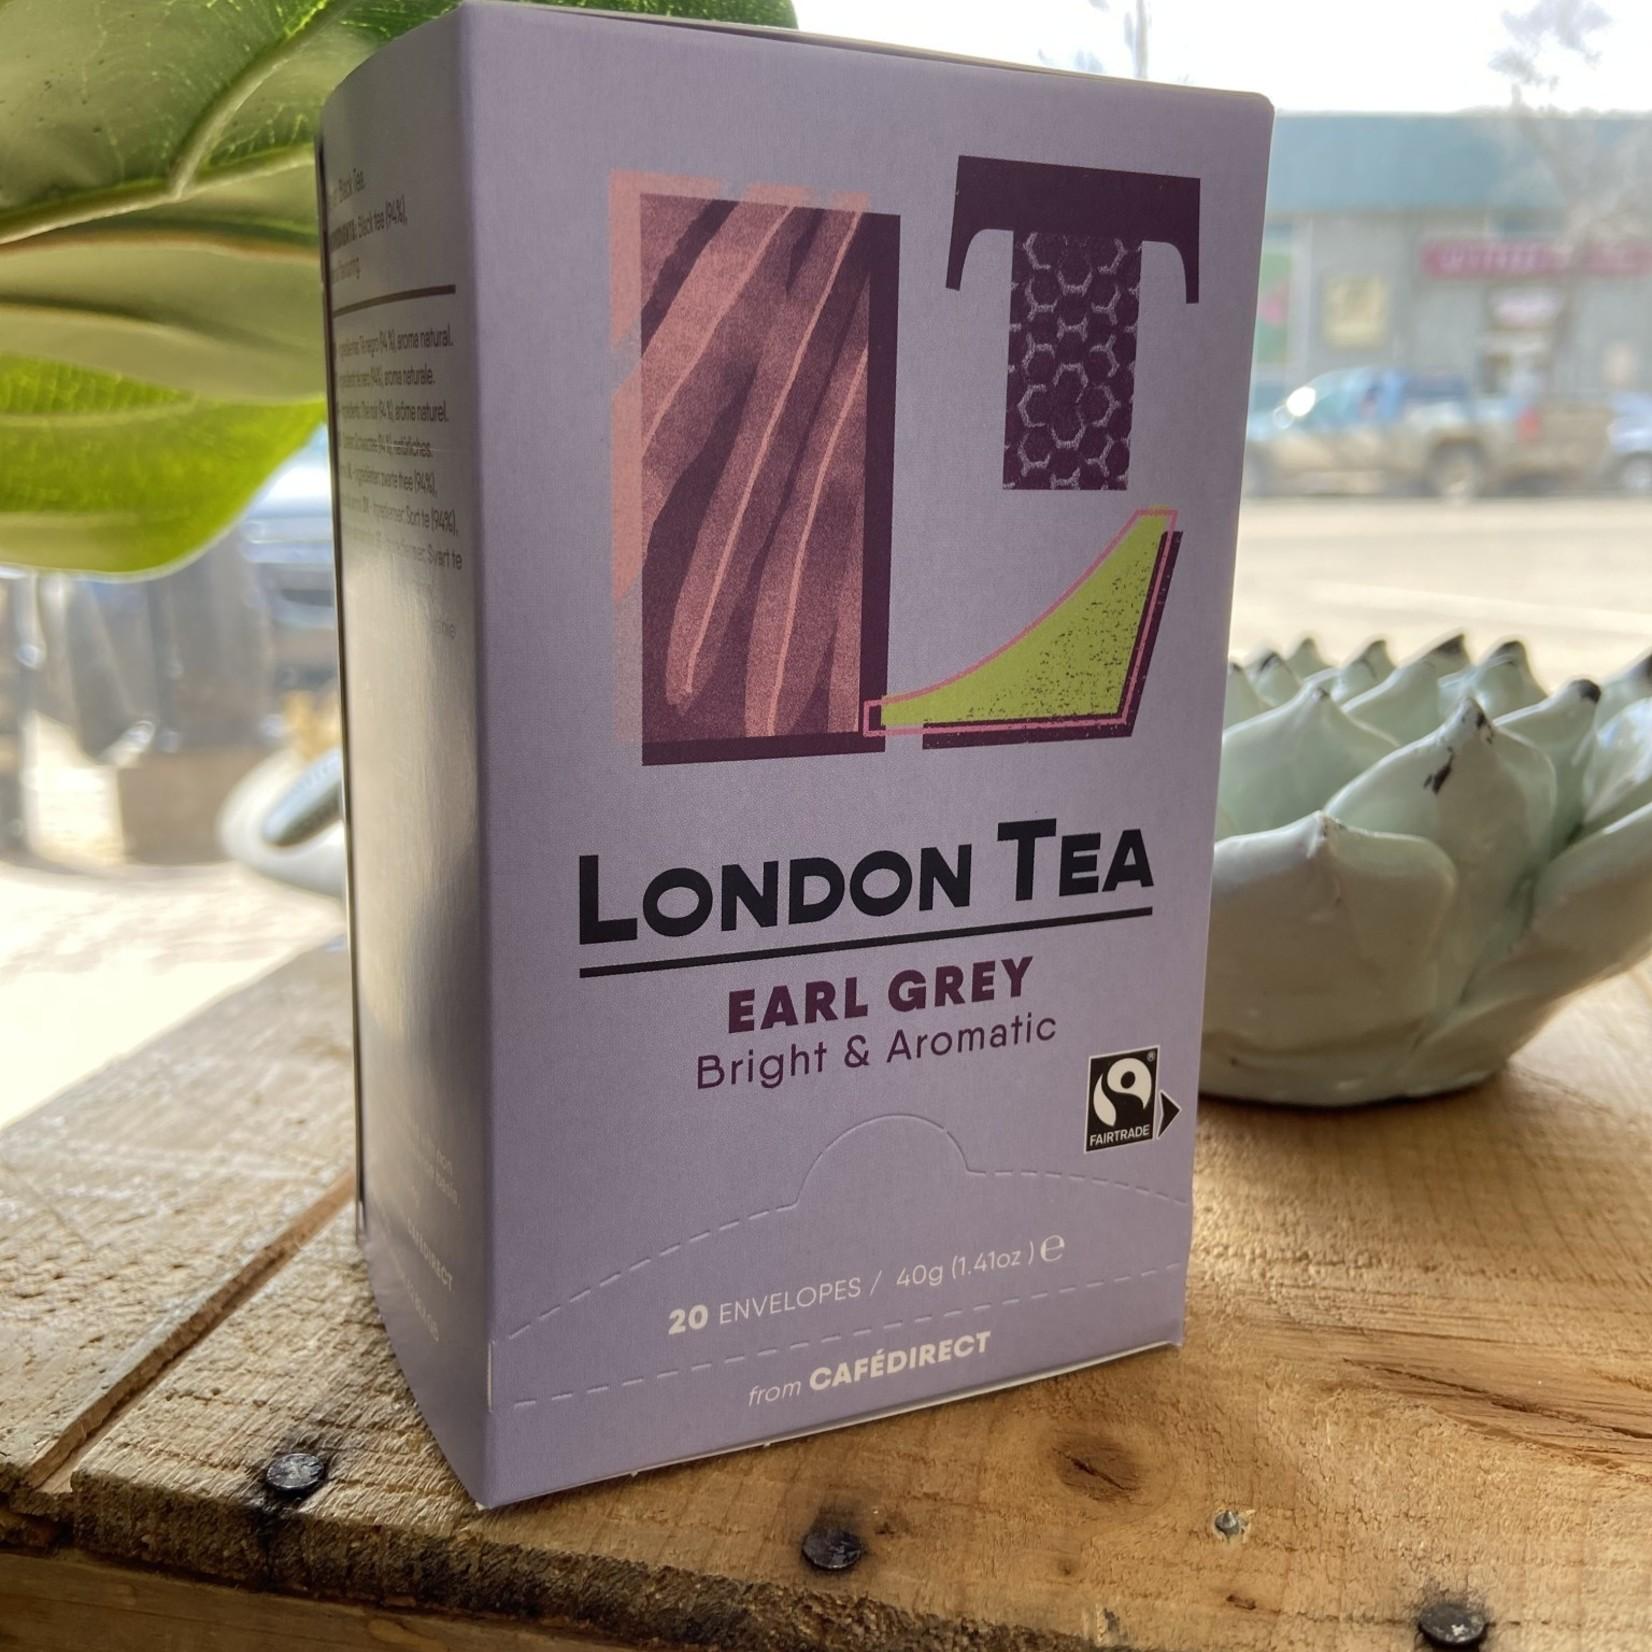 Dovetale London Tea Earl Grey